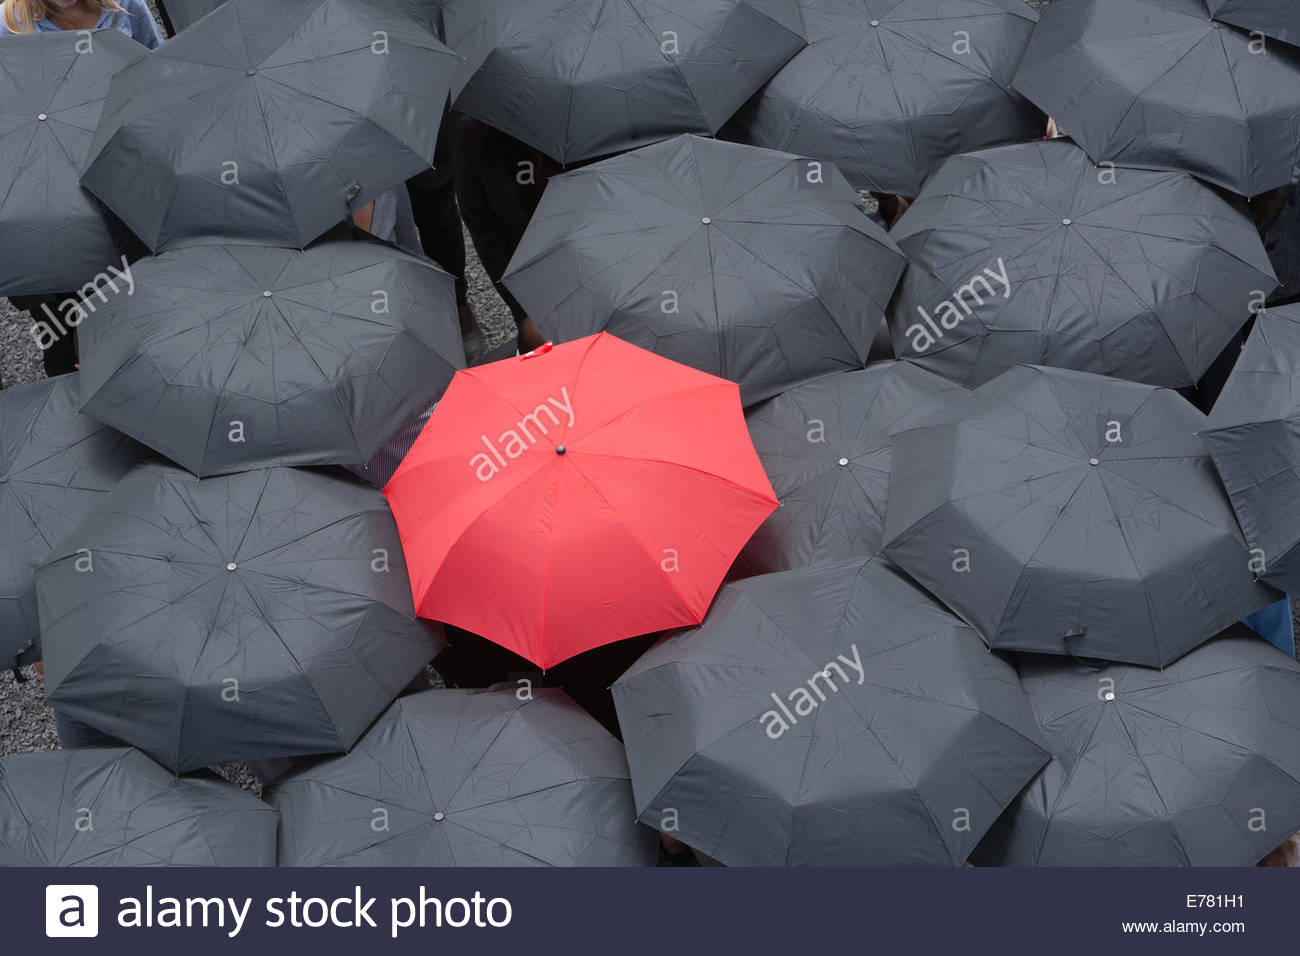 Una sombrilla roja en el centro de múltiples Paraguas negro Imagen De Stock